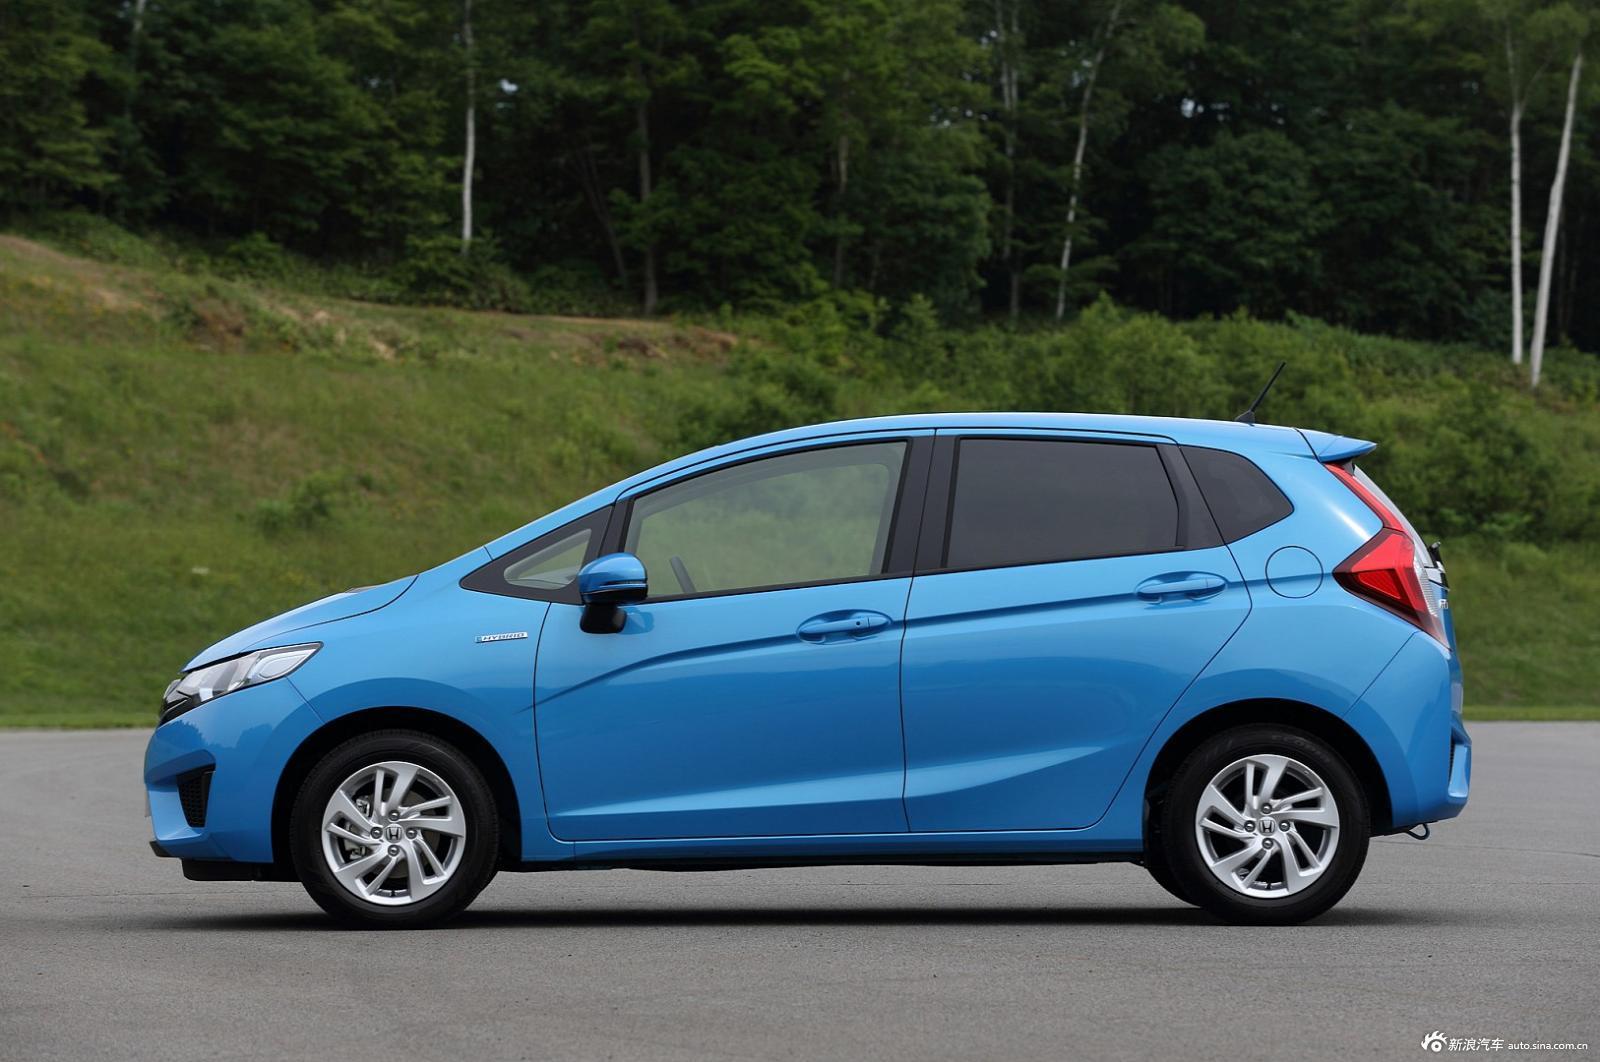 Honda Fit Colors >> 2014款飞度官方组图